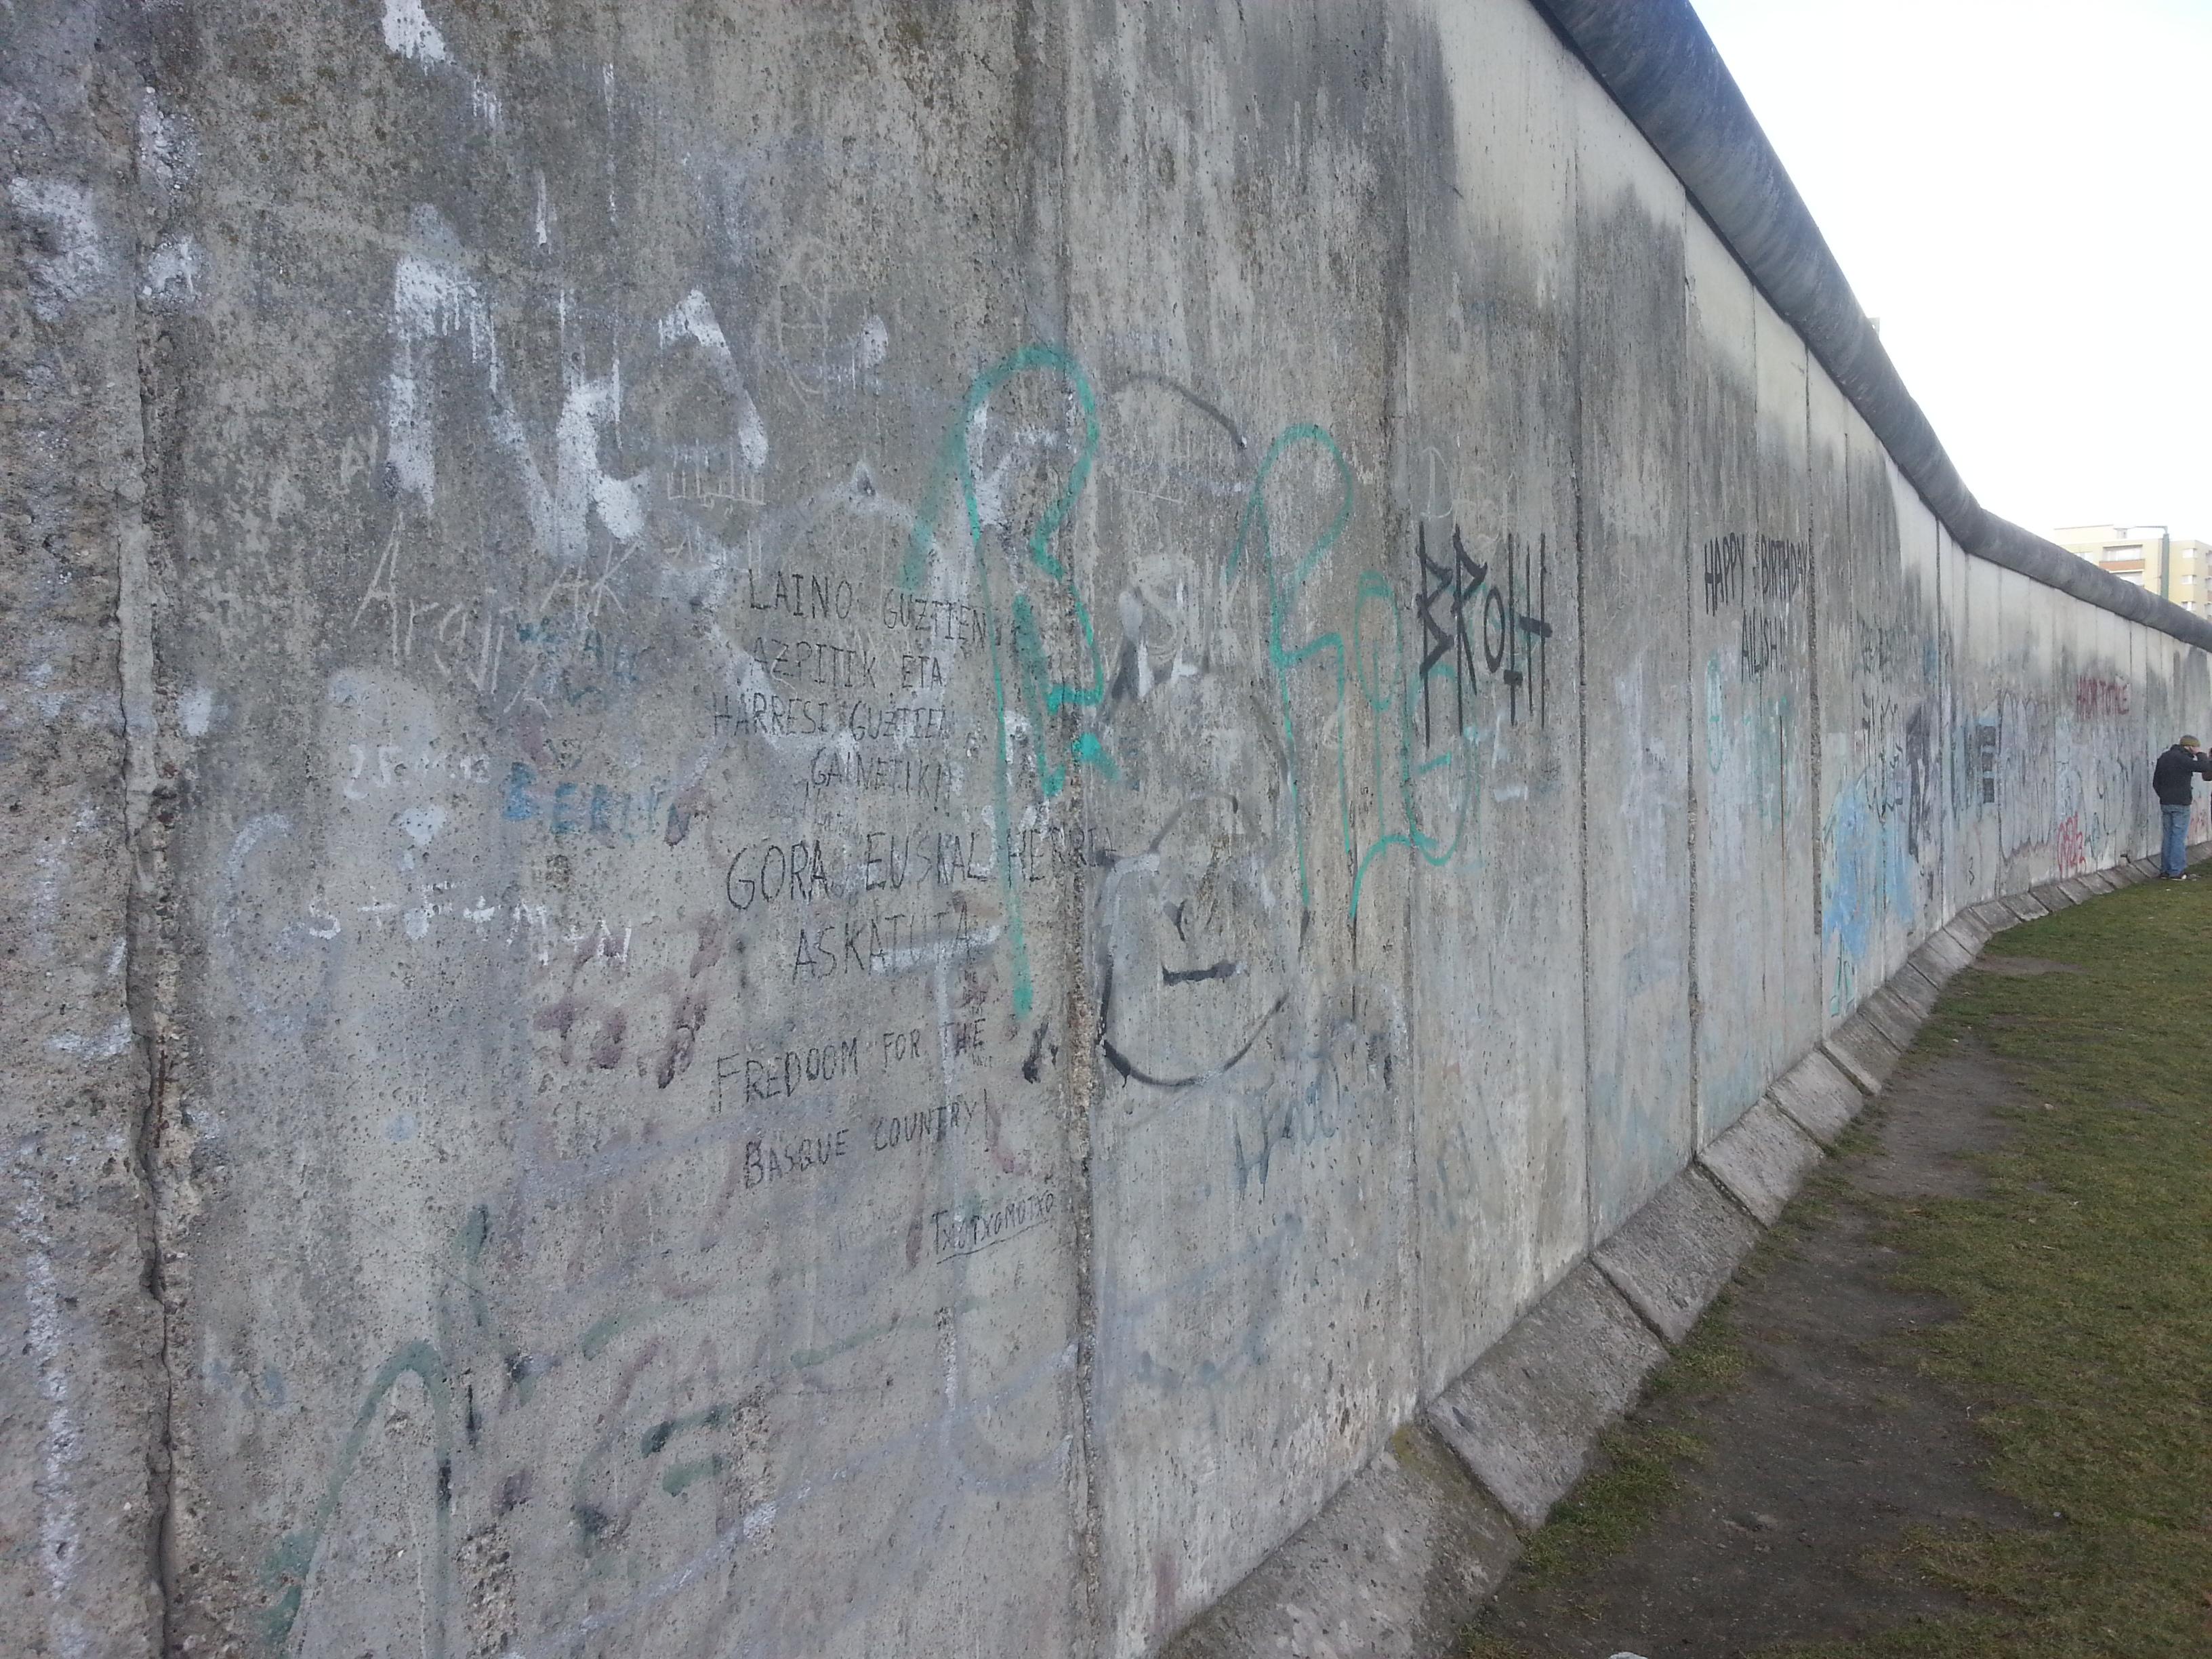 (Berlin Wall Memorial)